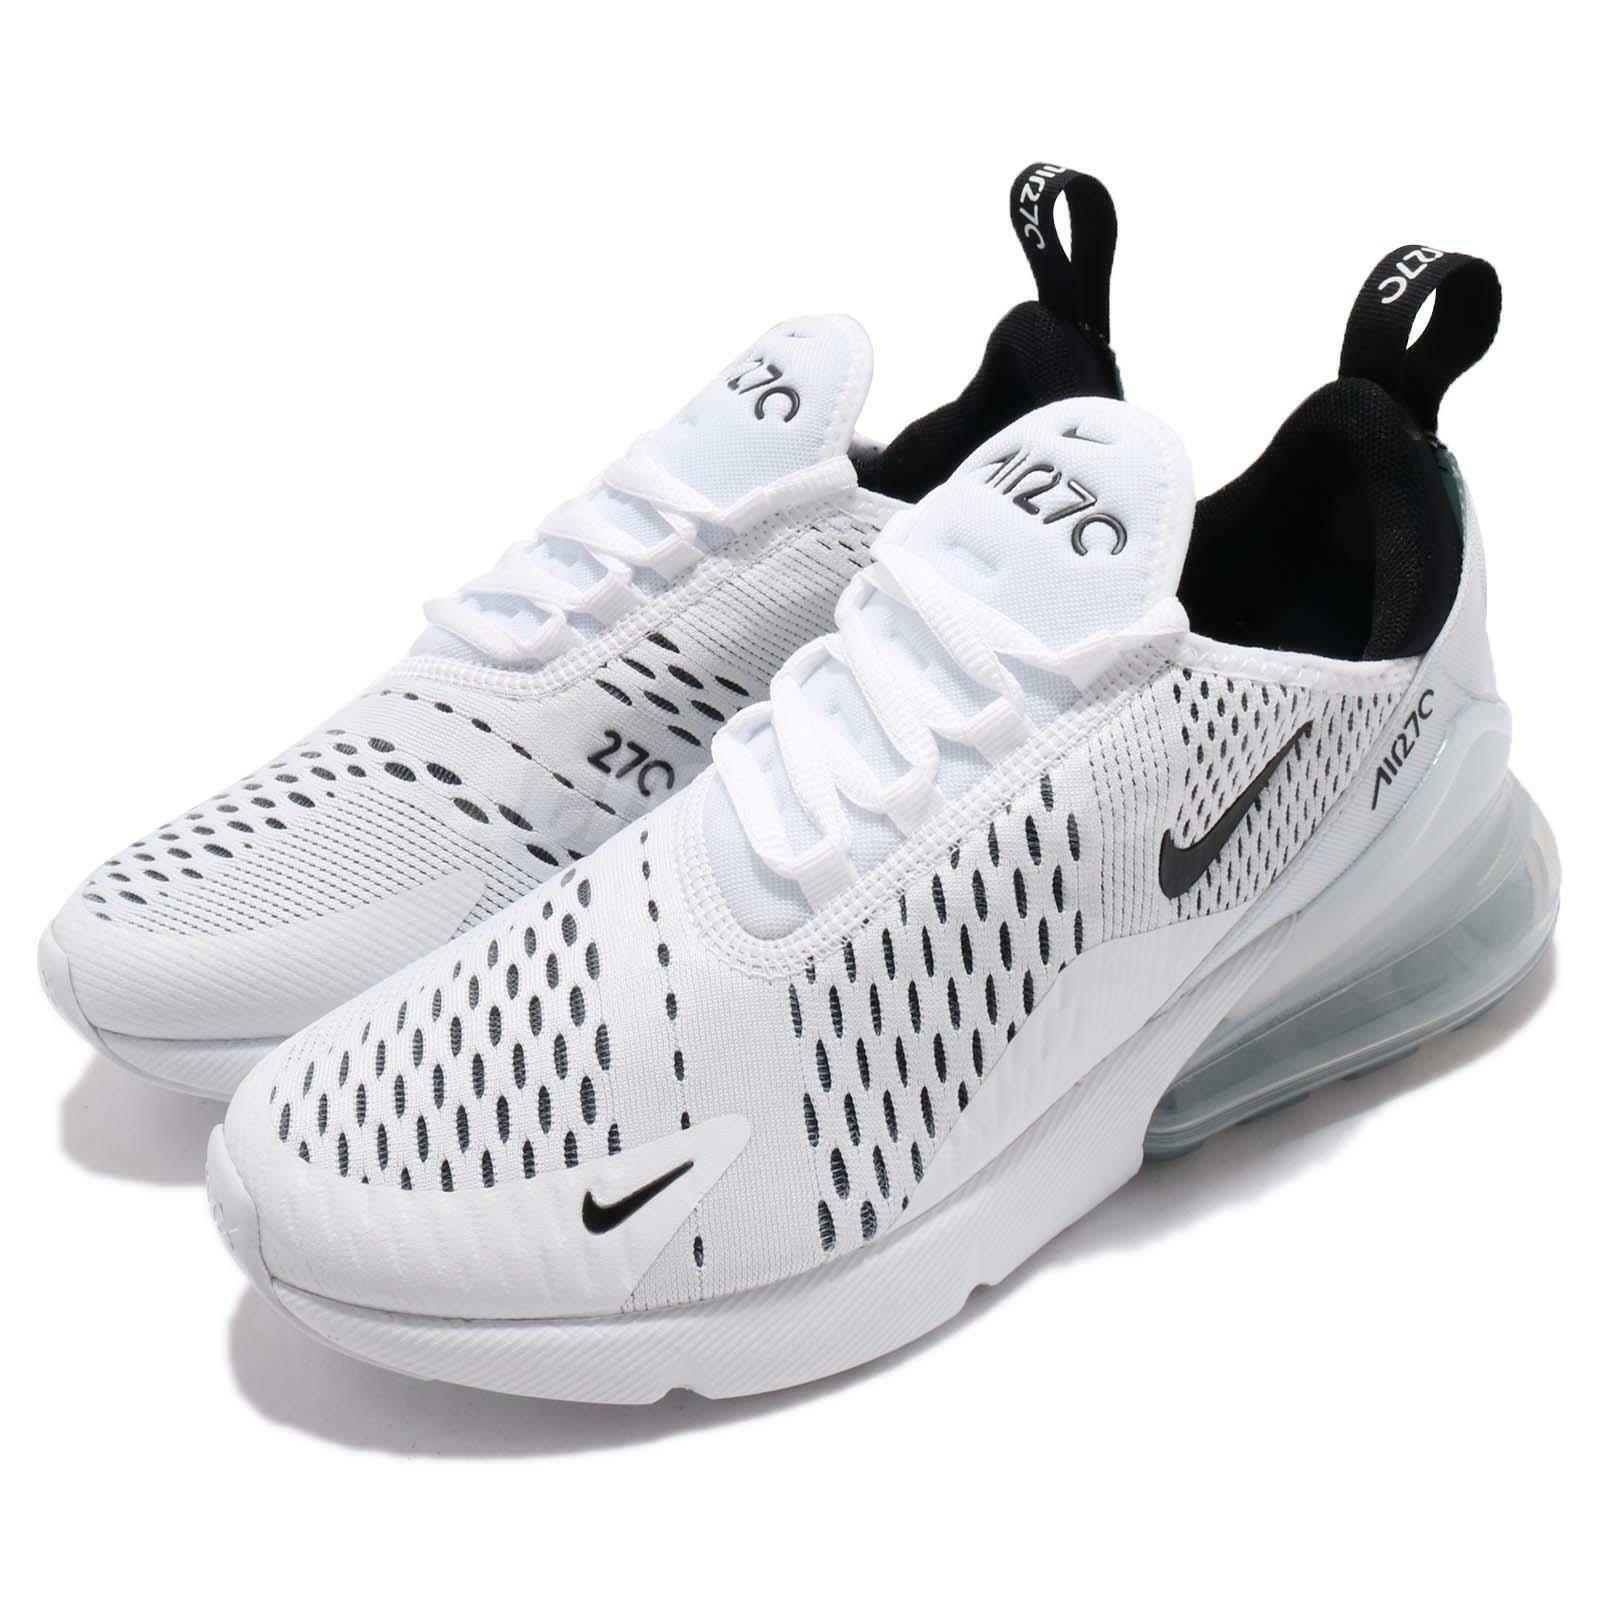 women's nike air max 27 shoes